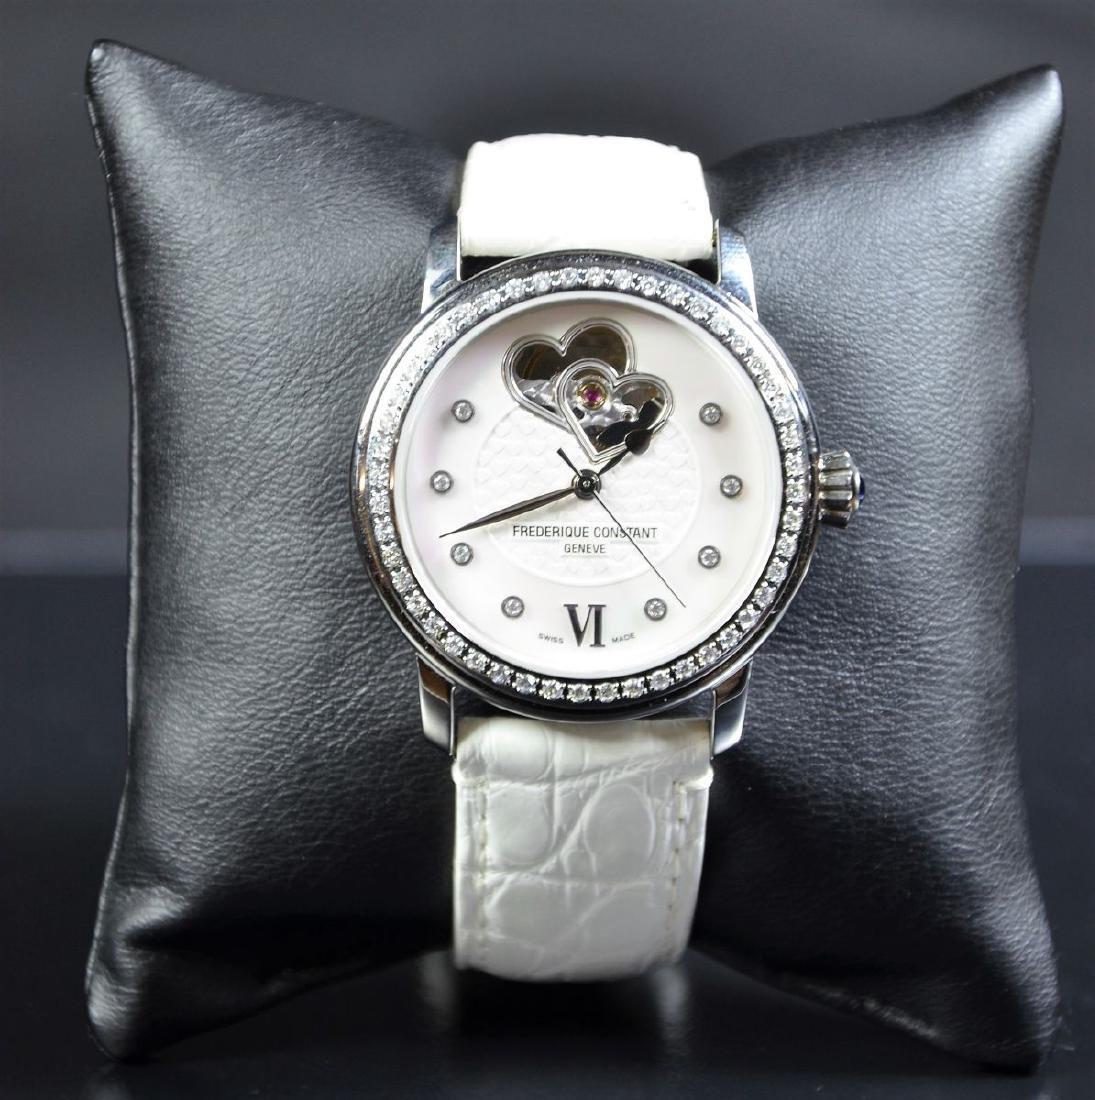 Steel watch with diamonds FREDERIQUE CONSTANT, nacre